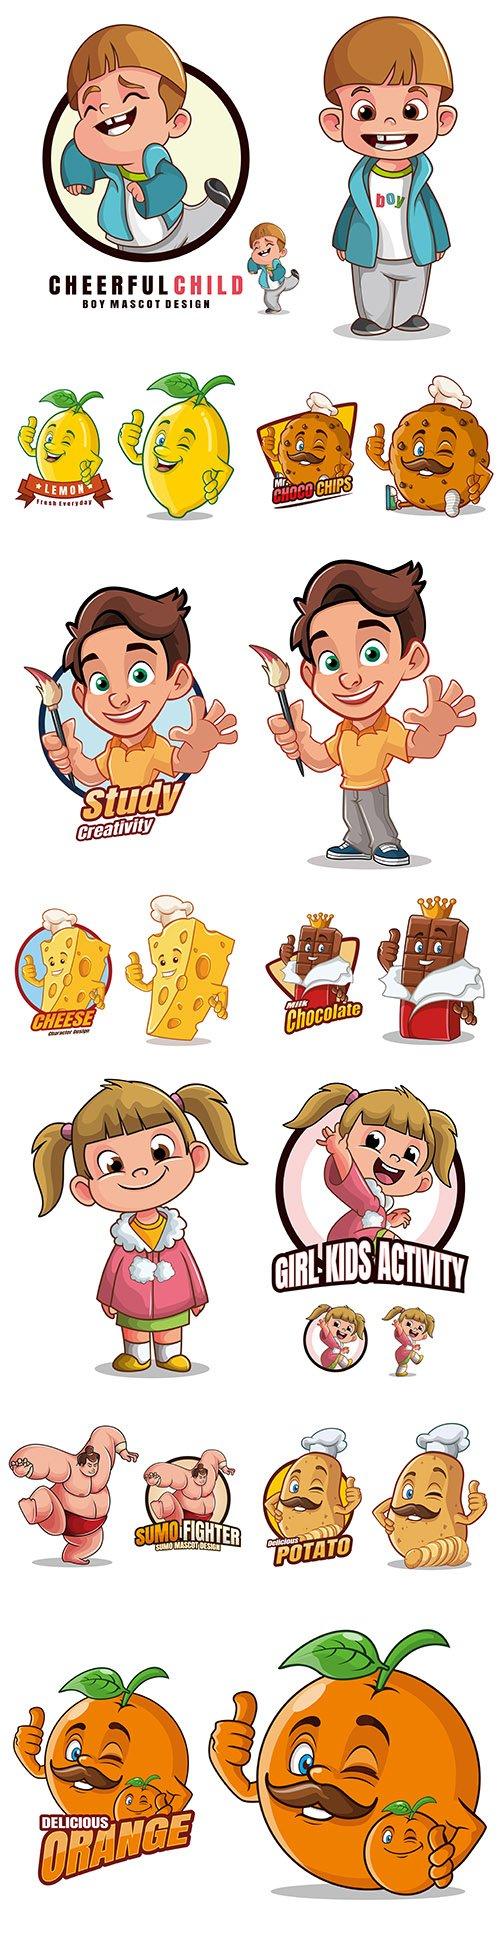 Mascot funny cartoon character design illustration 2